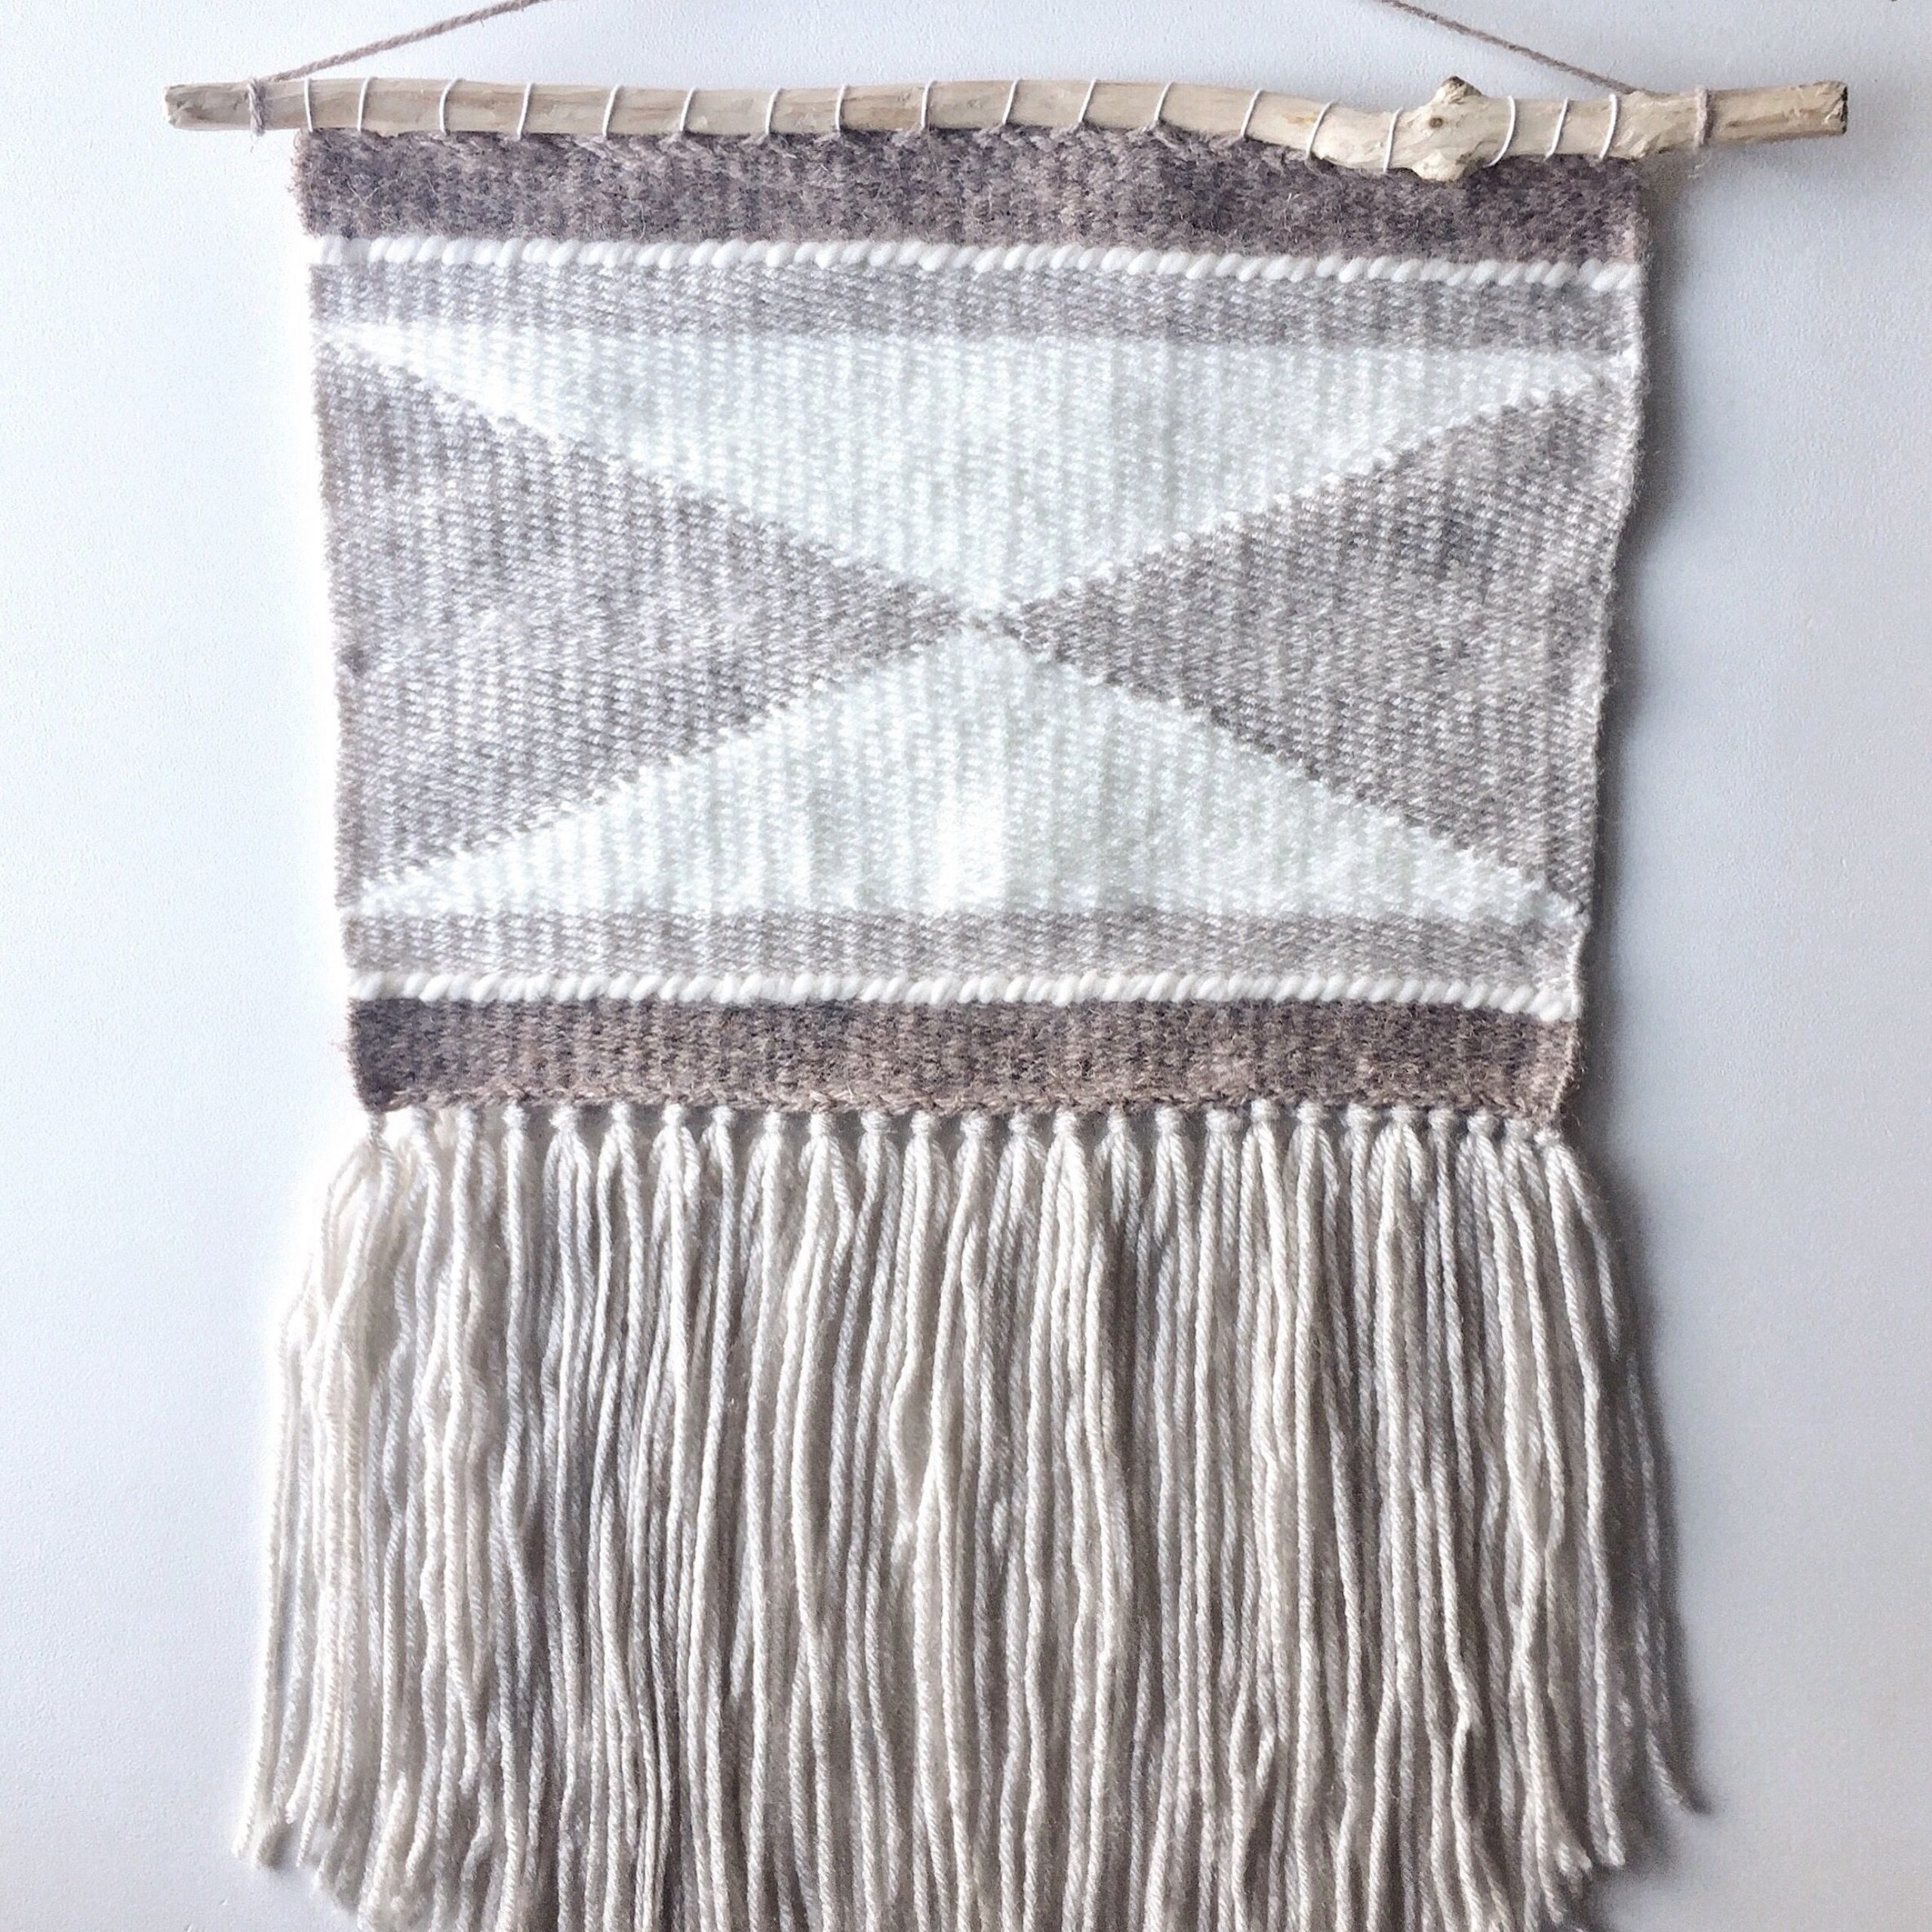 Pin On Weaving Regarding 2017 Blended Fabric Irises Tapestries (View 15 of 20)